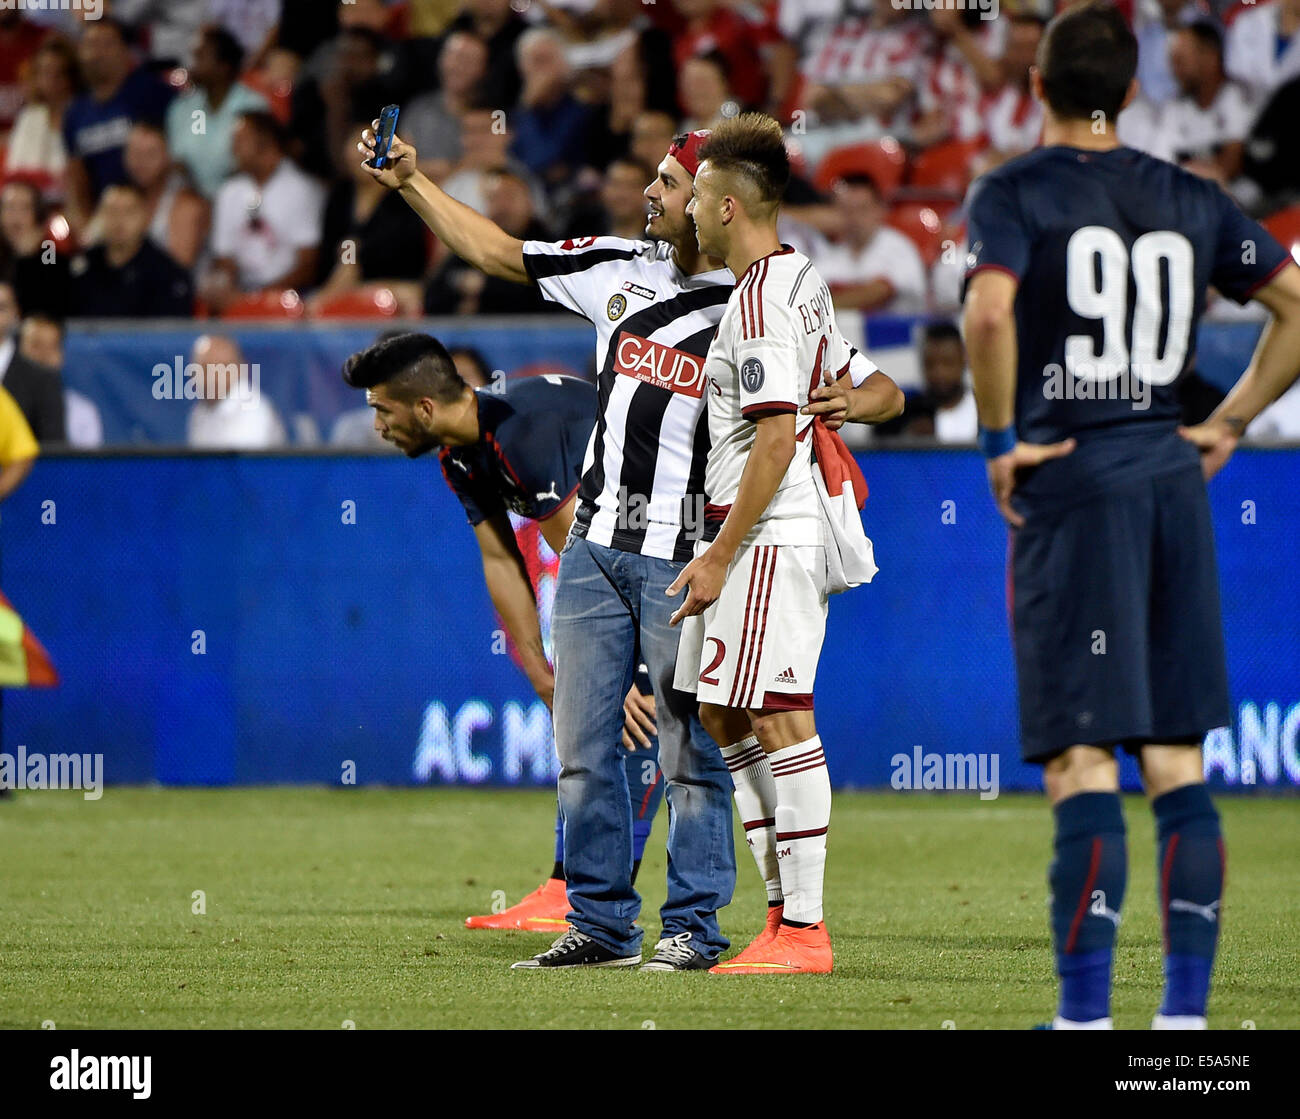 International Champions Cup Milan Vs Barcelona: Ac Milan Fans Stock Photos & Ac Milan Fans Stock Images